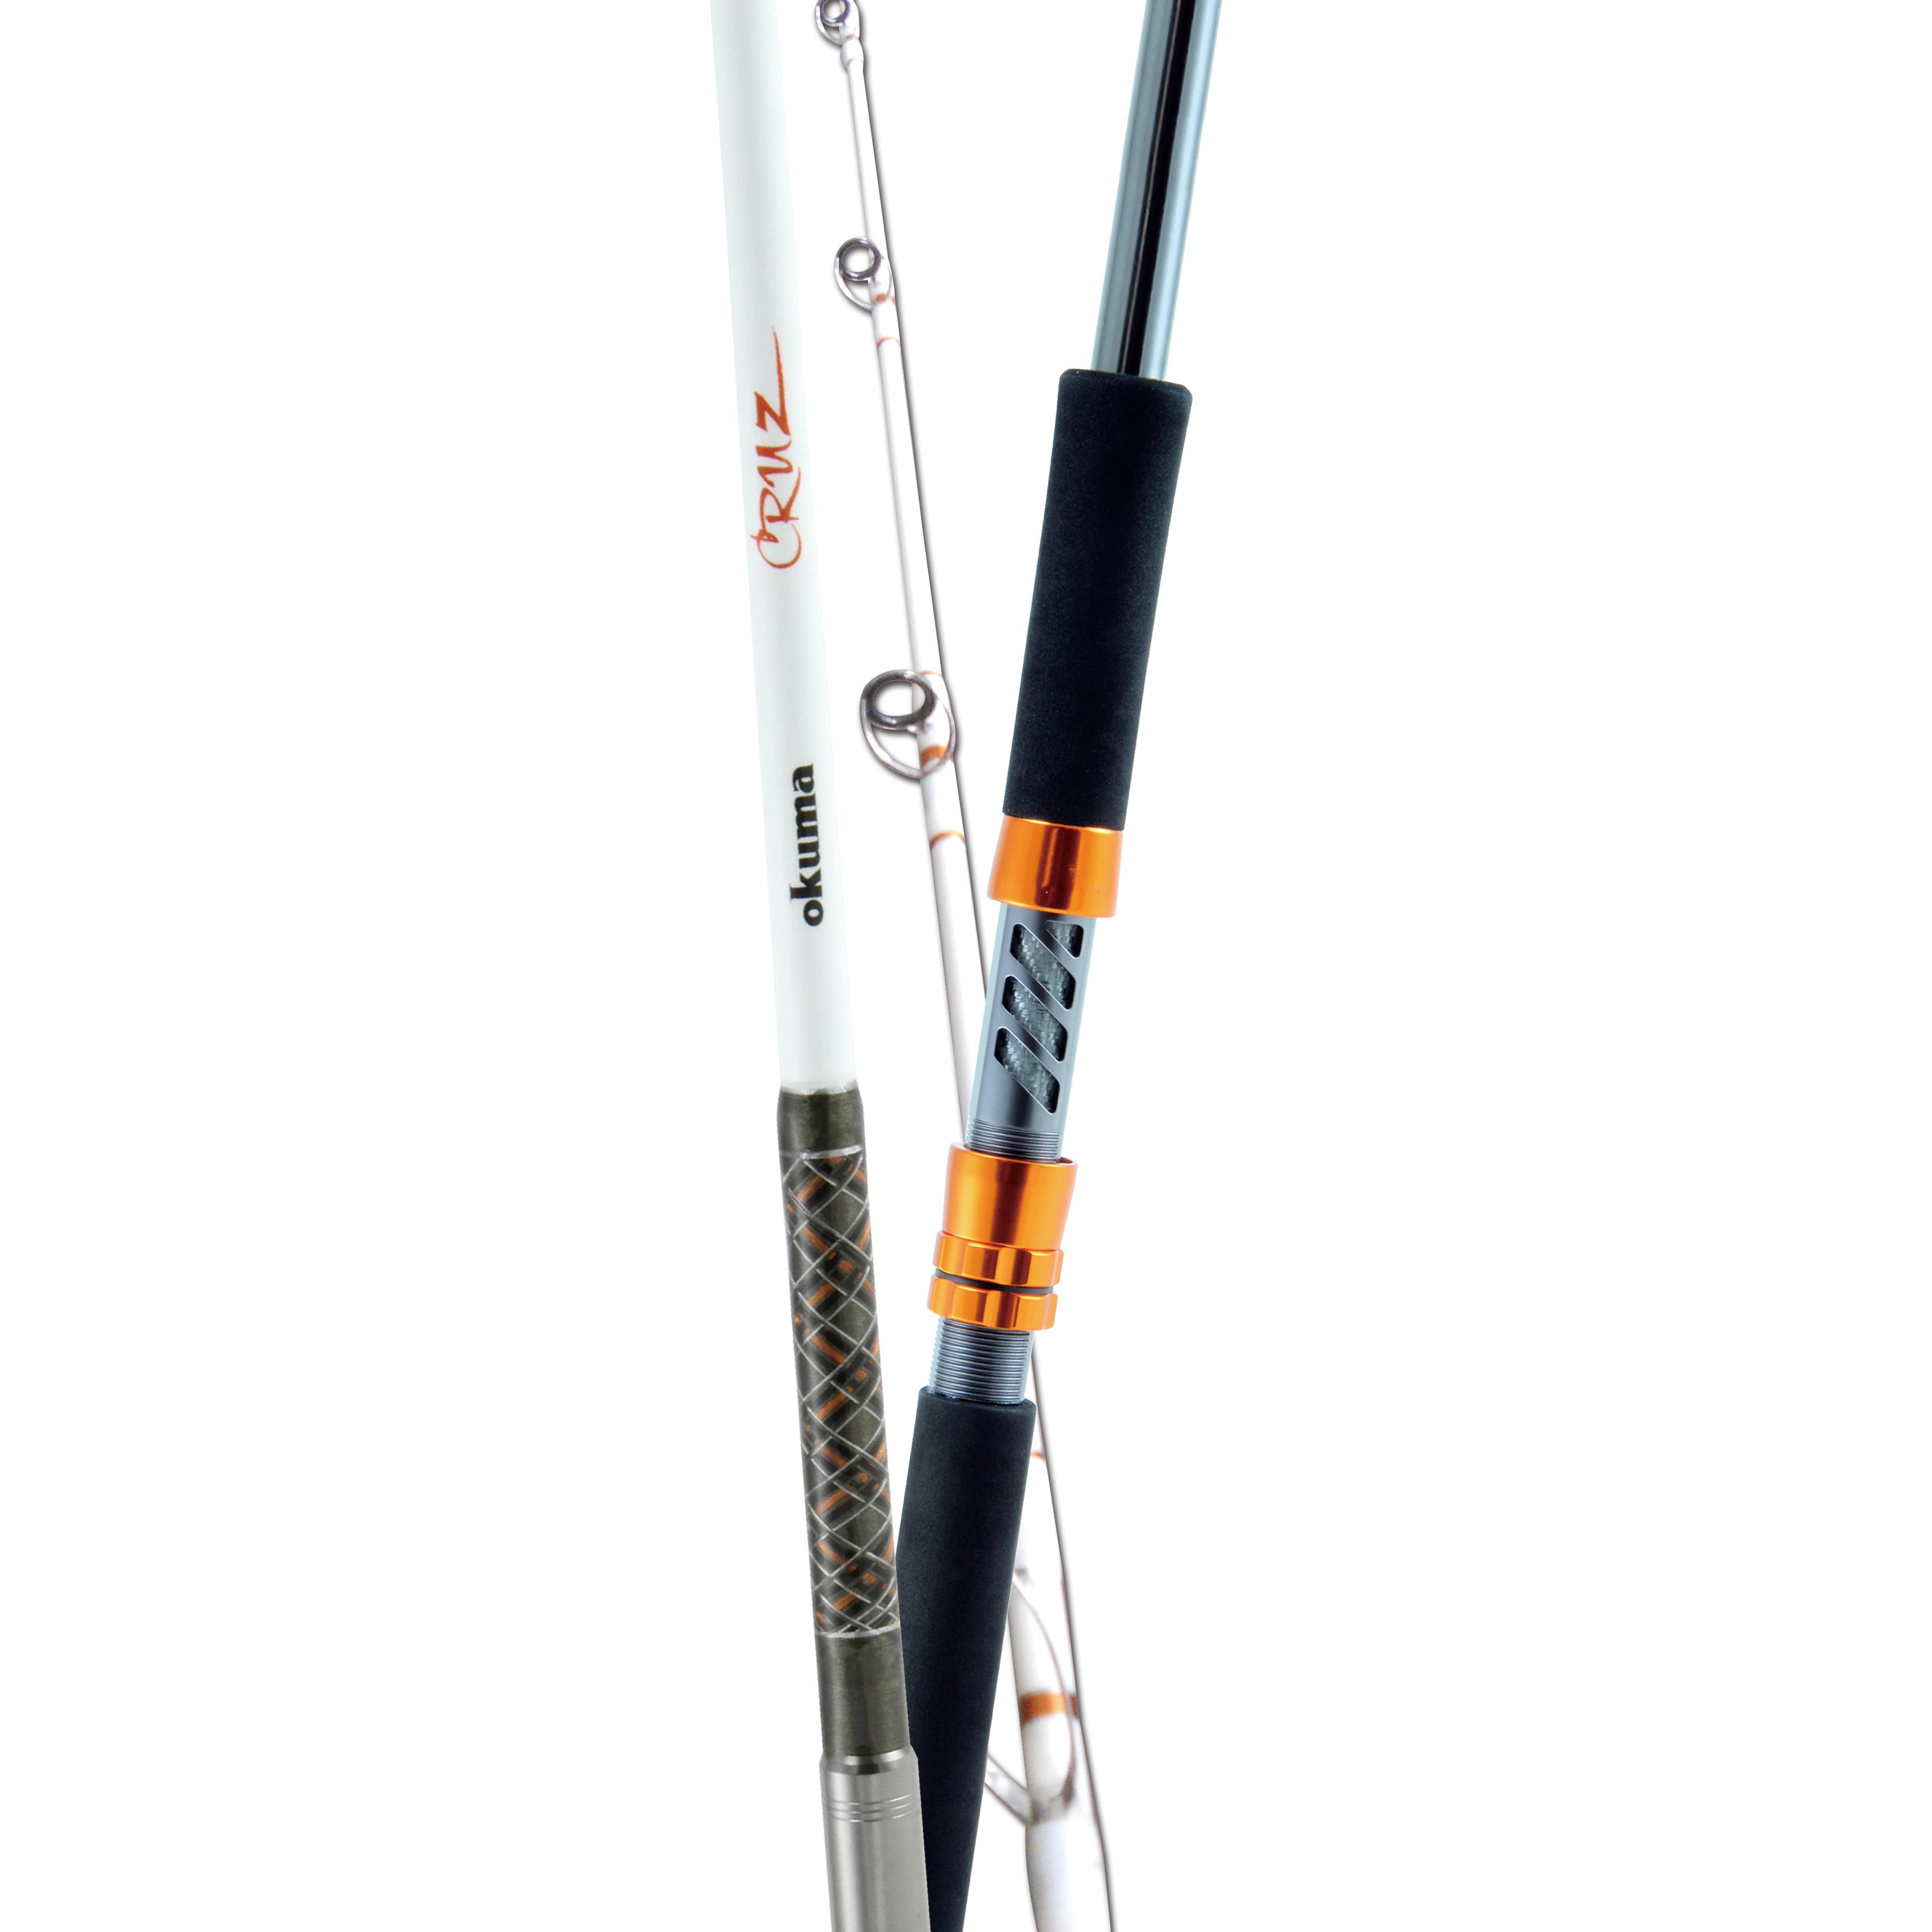 Cruz Popping Rod - Cruz Popping Rod